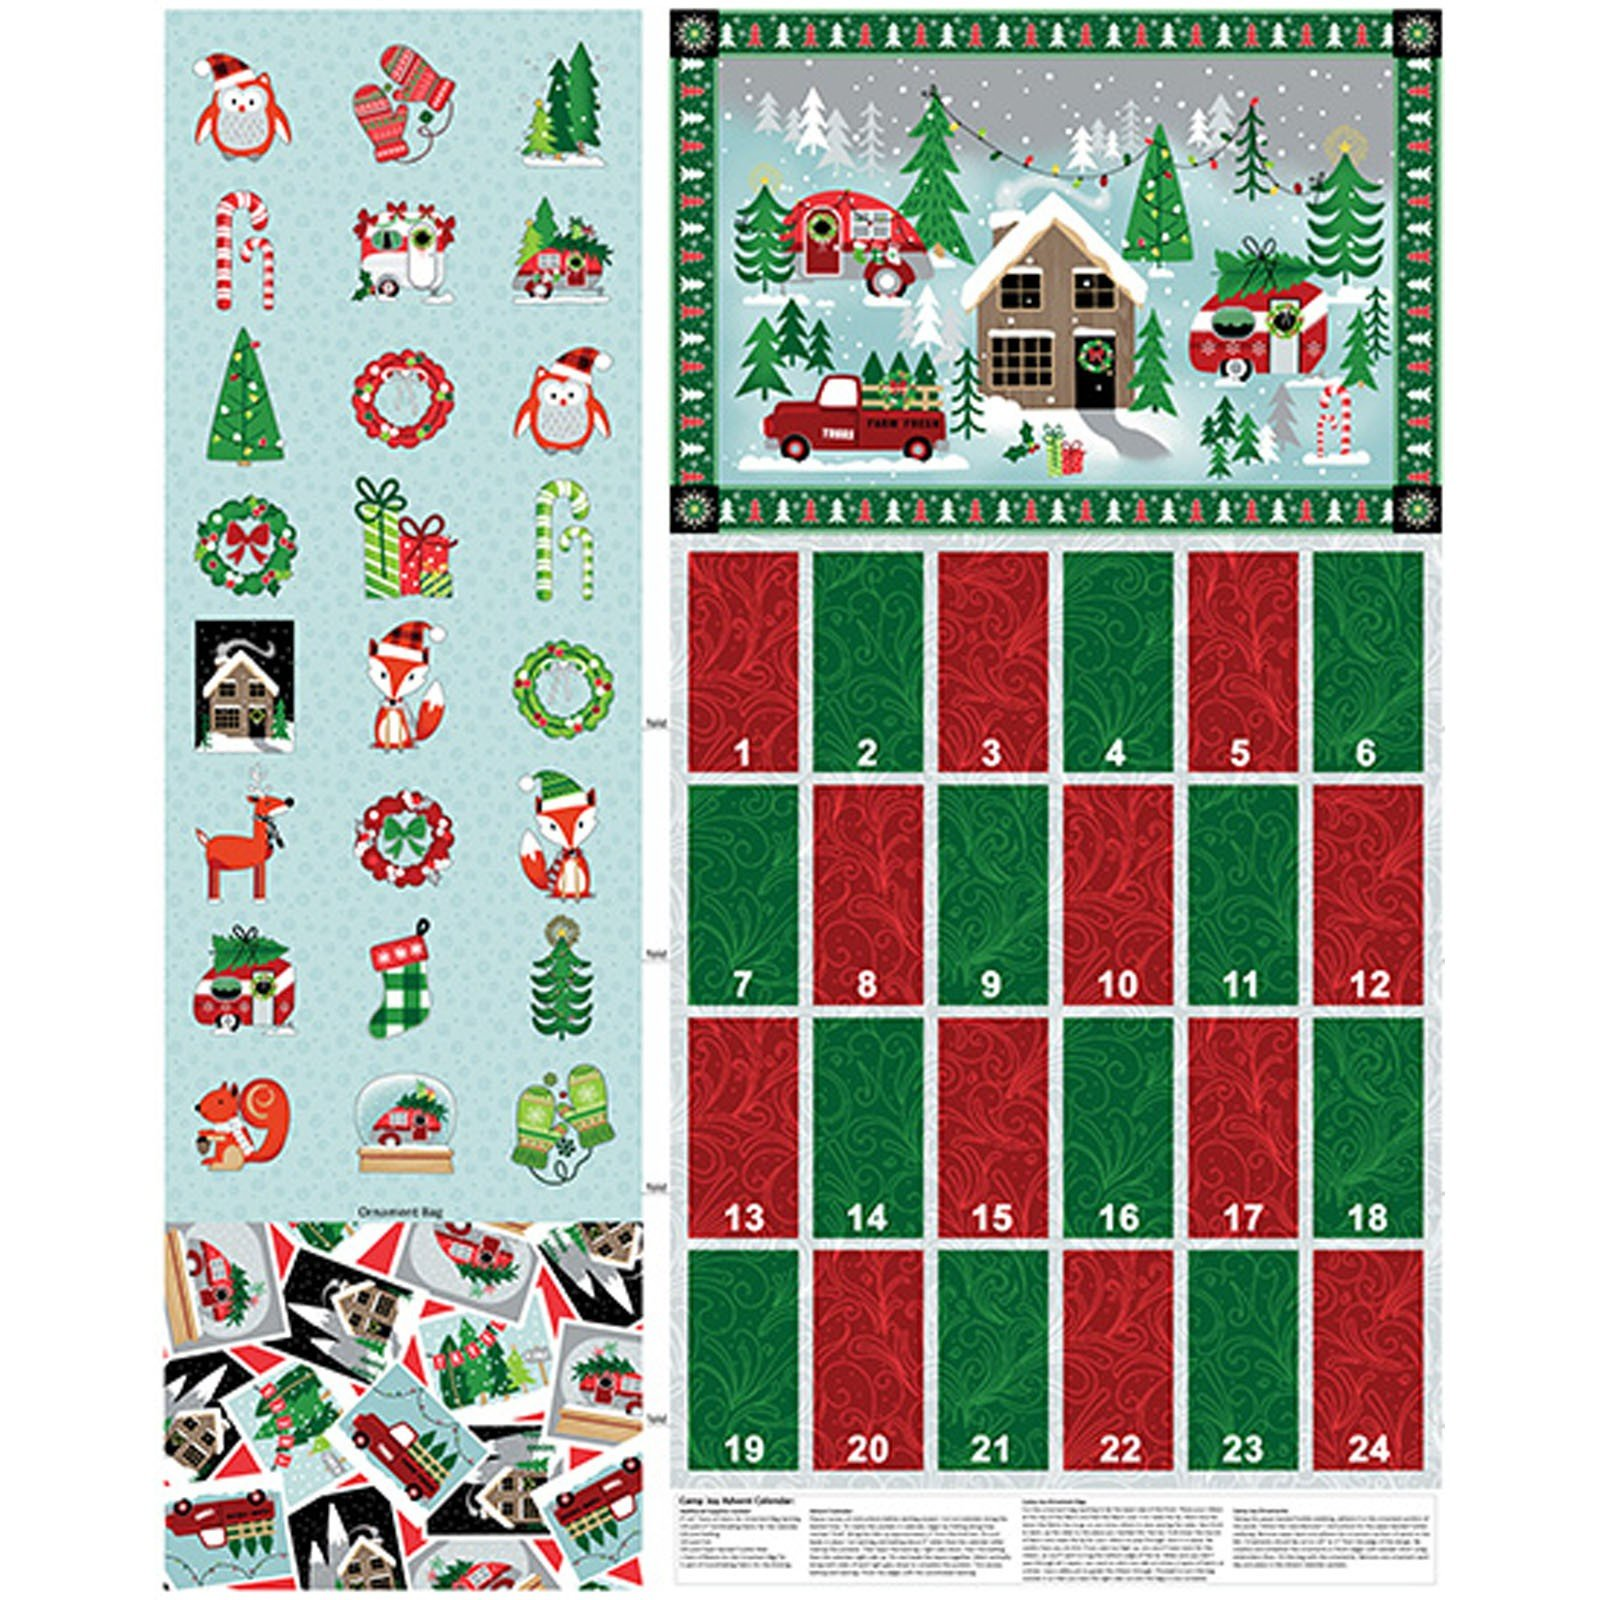 Camp Joy Advent Calendar Panel<br/>Kanvas Studio 7996-99